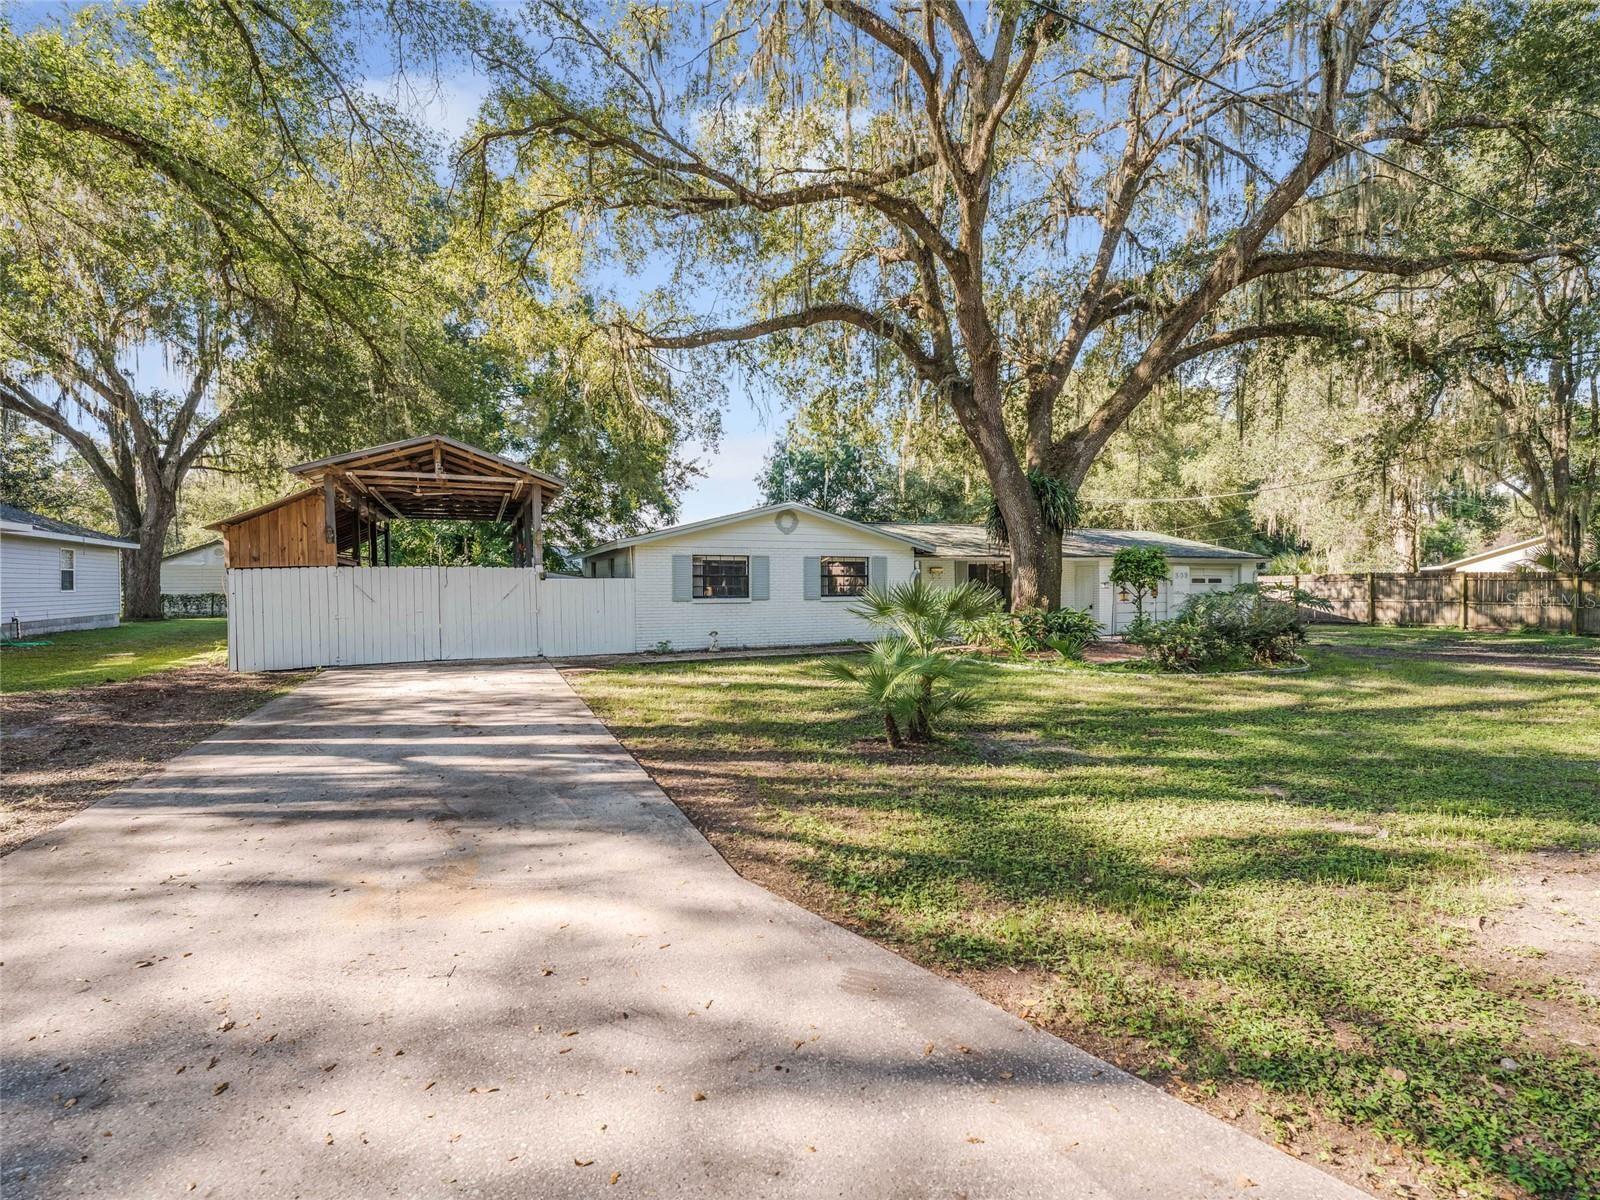 309 W COLLINS AVE, Bushnell, FL 33513 - #: G5047265